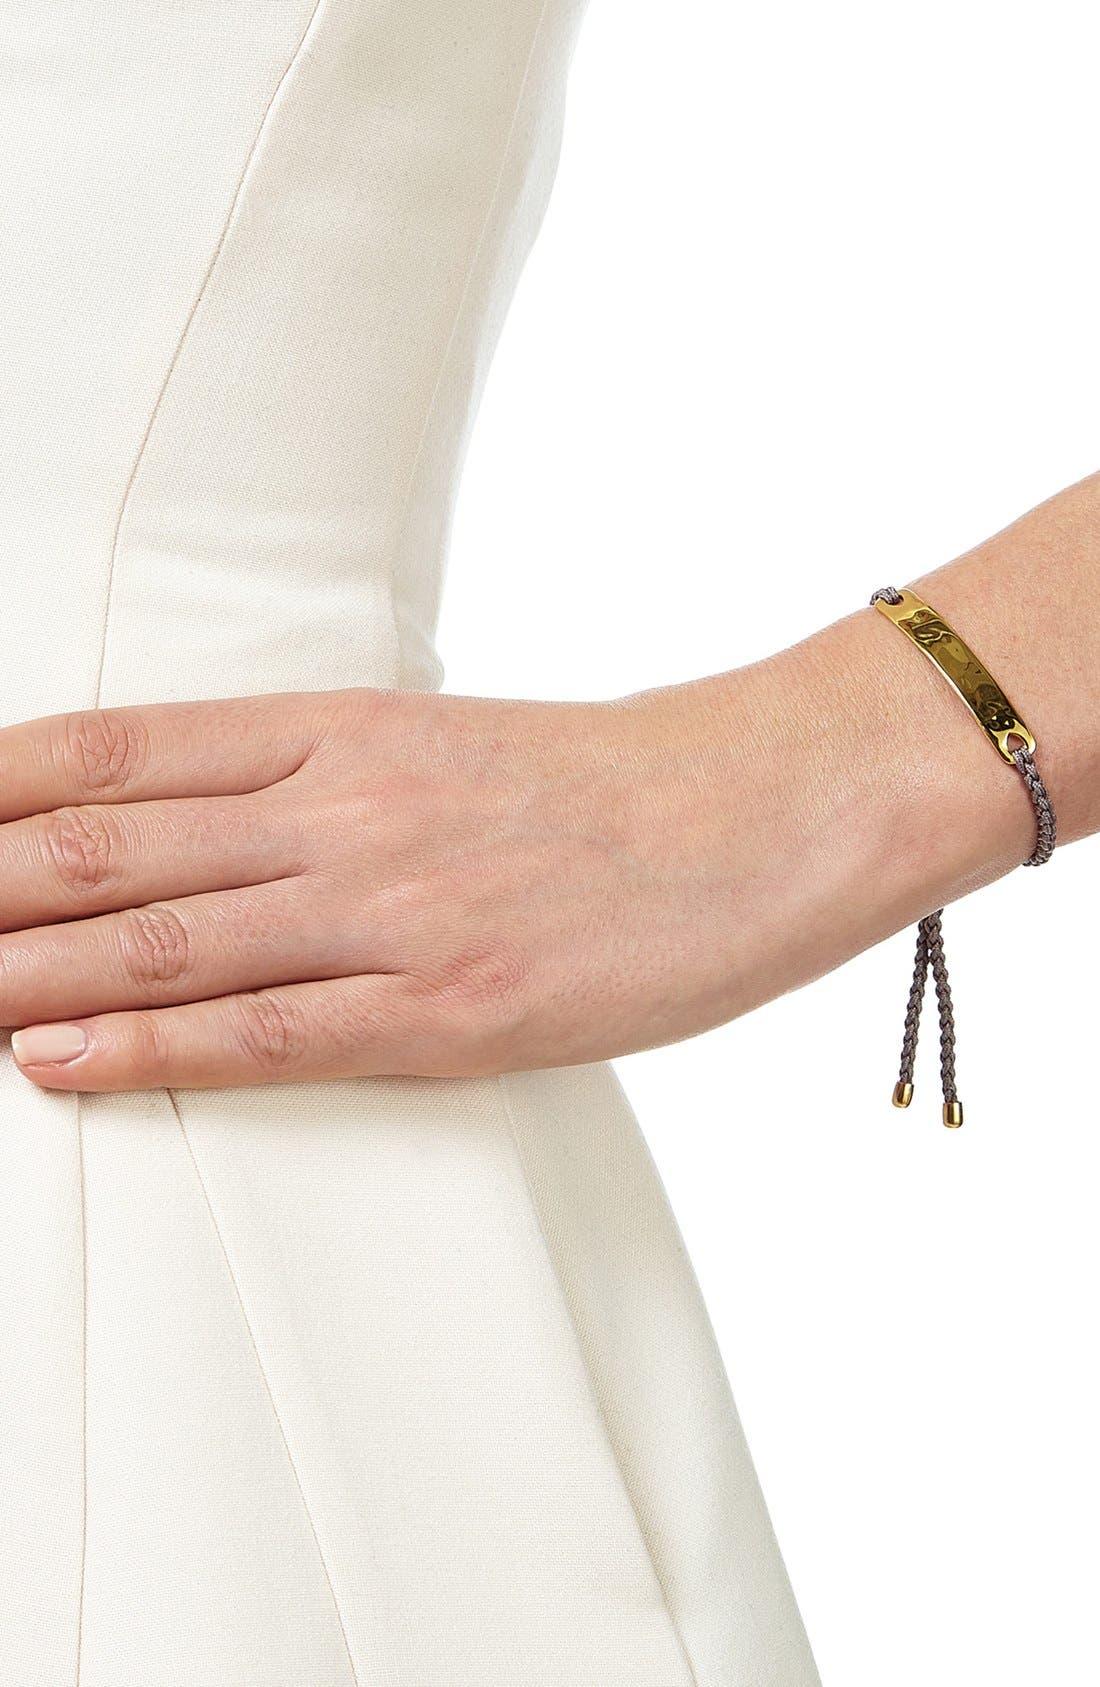 Engravable HavanaFriendship Bracelet,                             Alternate thumbnail 4, color,                             YELLOW GOLD/ MINK